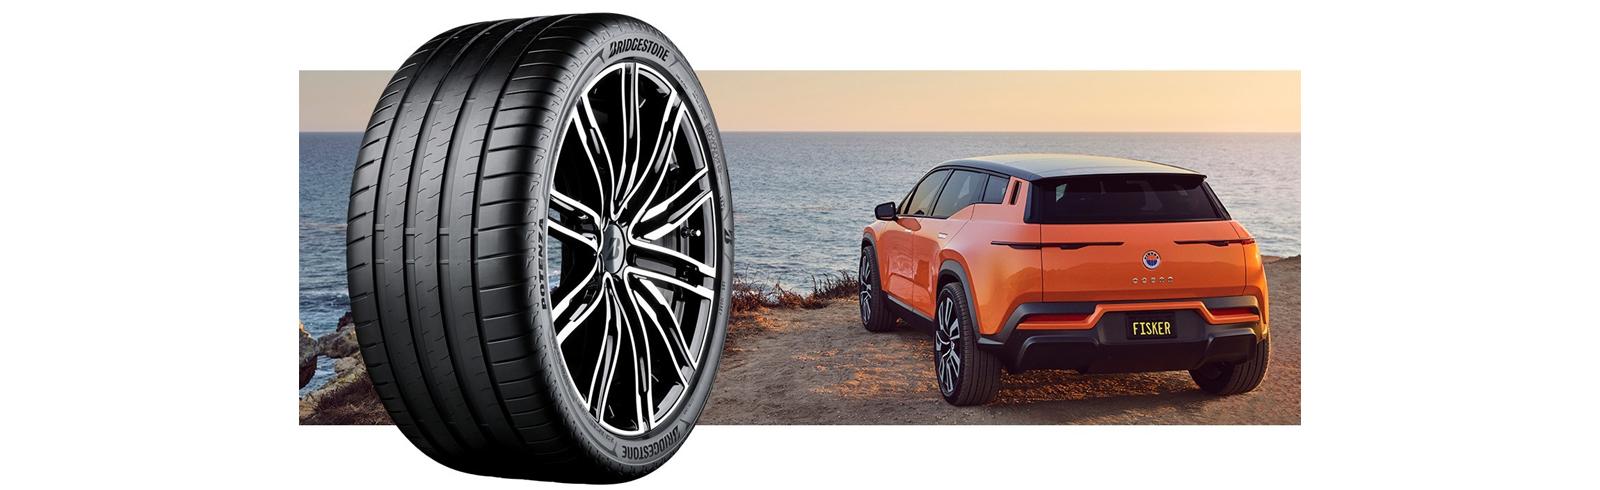 Fisker Ocean will be equipped with Bridgestone tires